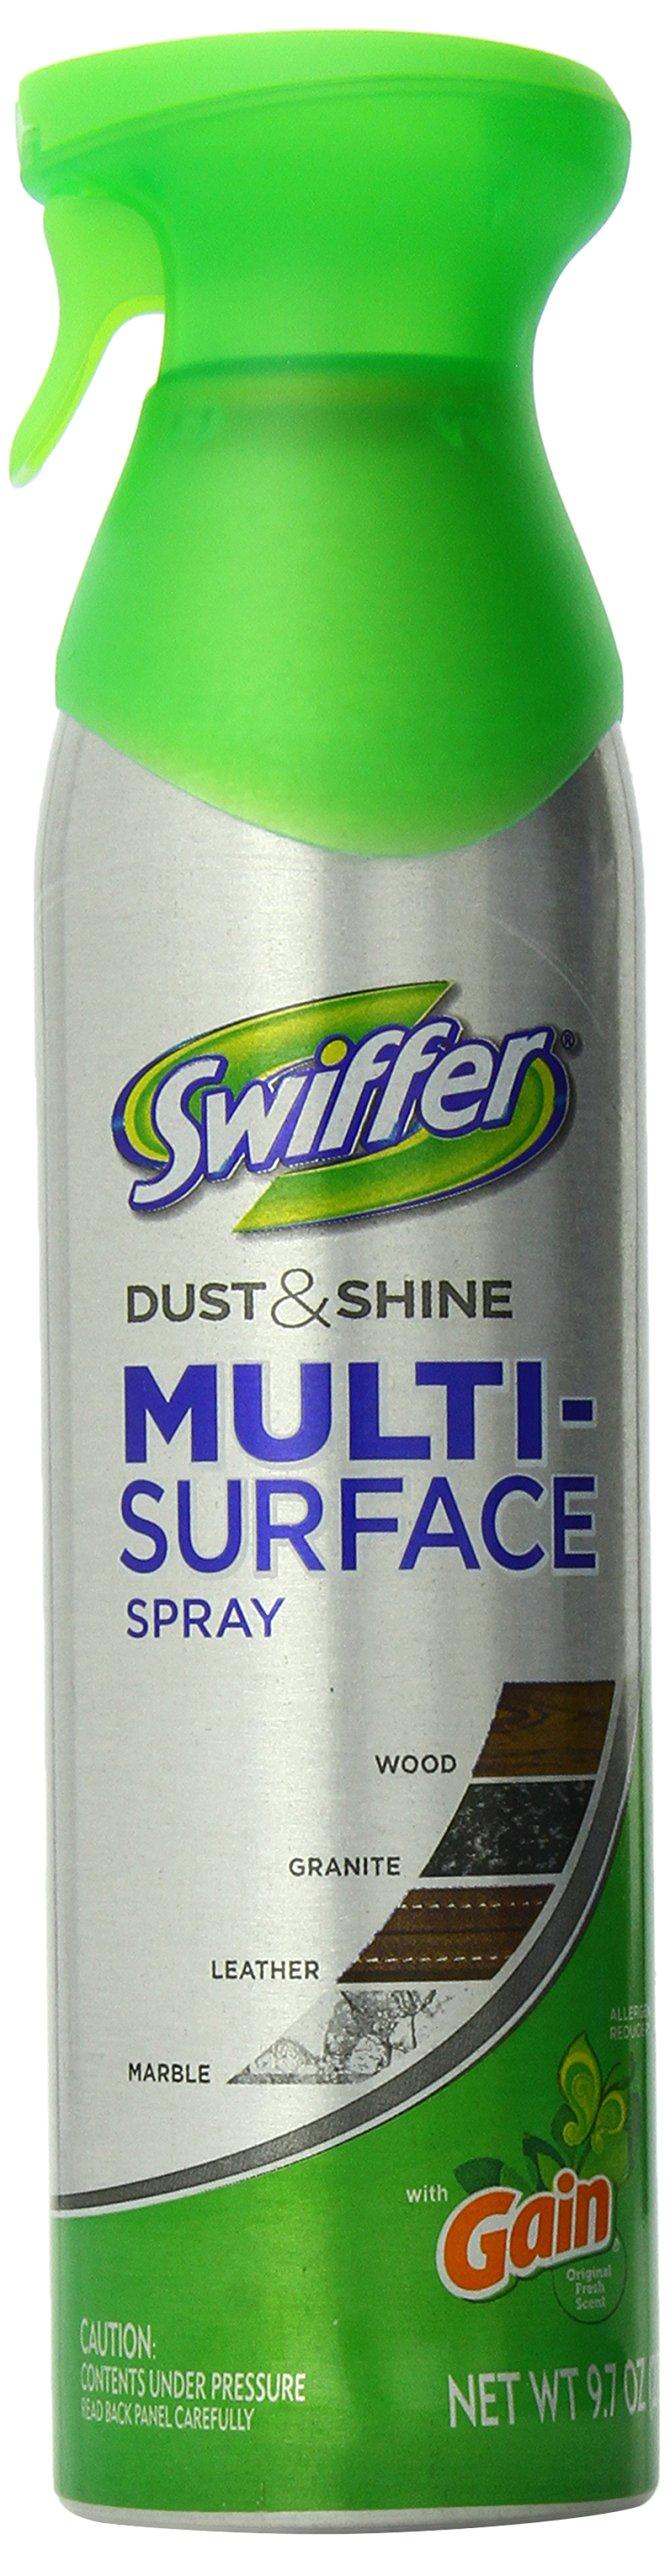 Swiffer Dust & Shine Multi Surface Spray, 9.7-Ounce